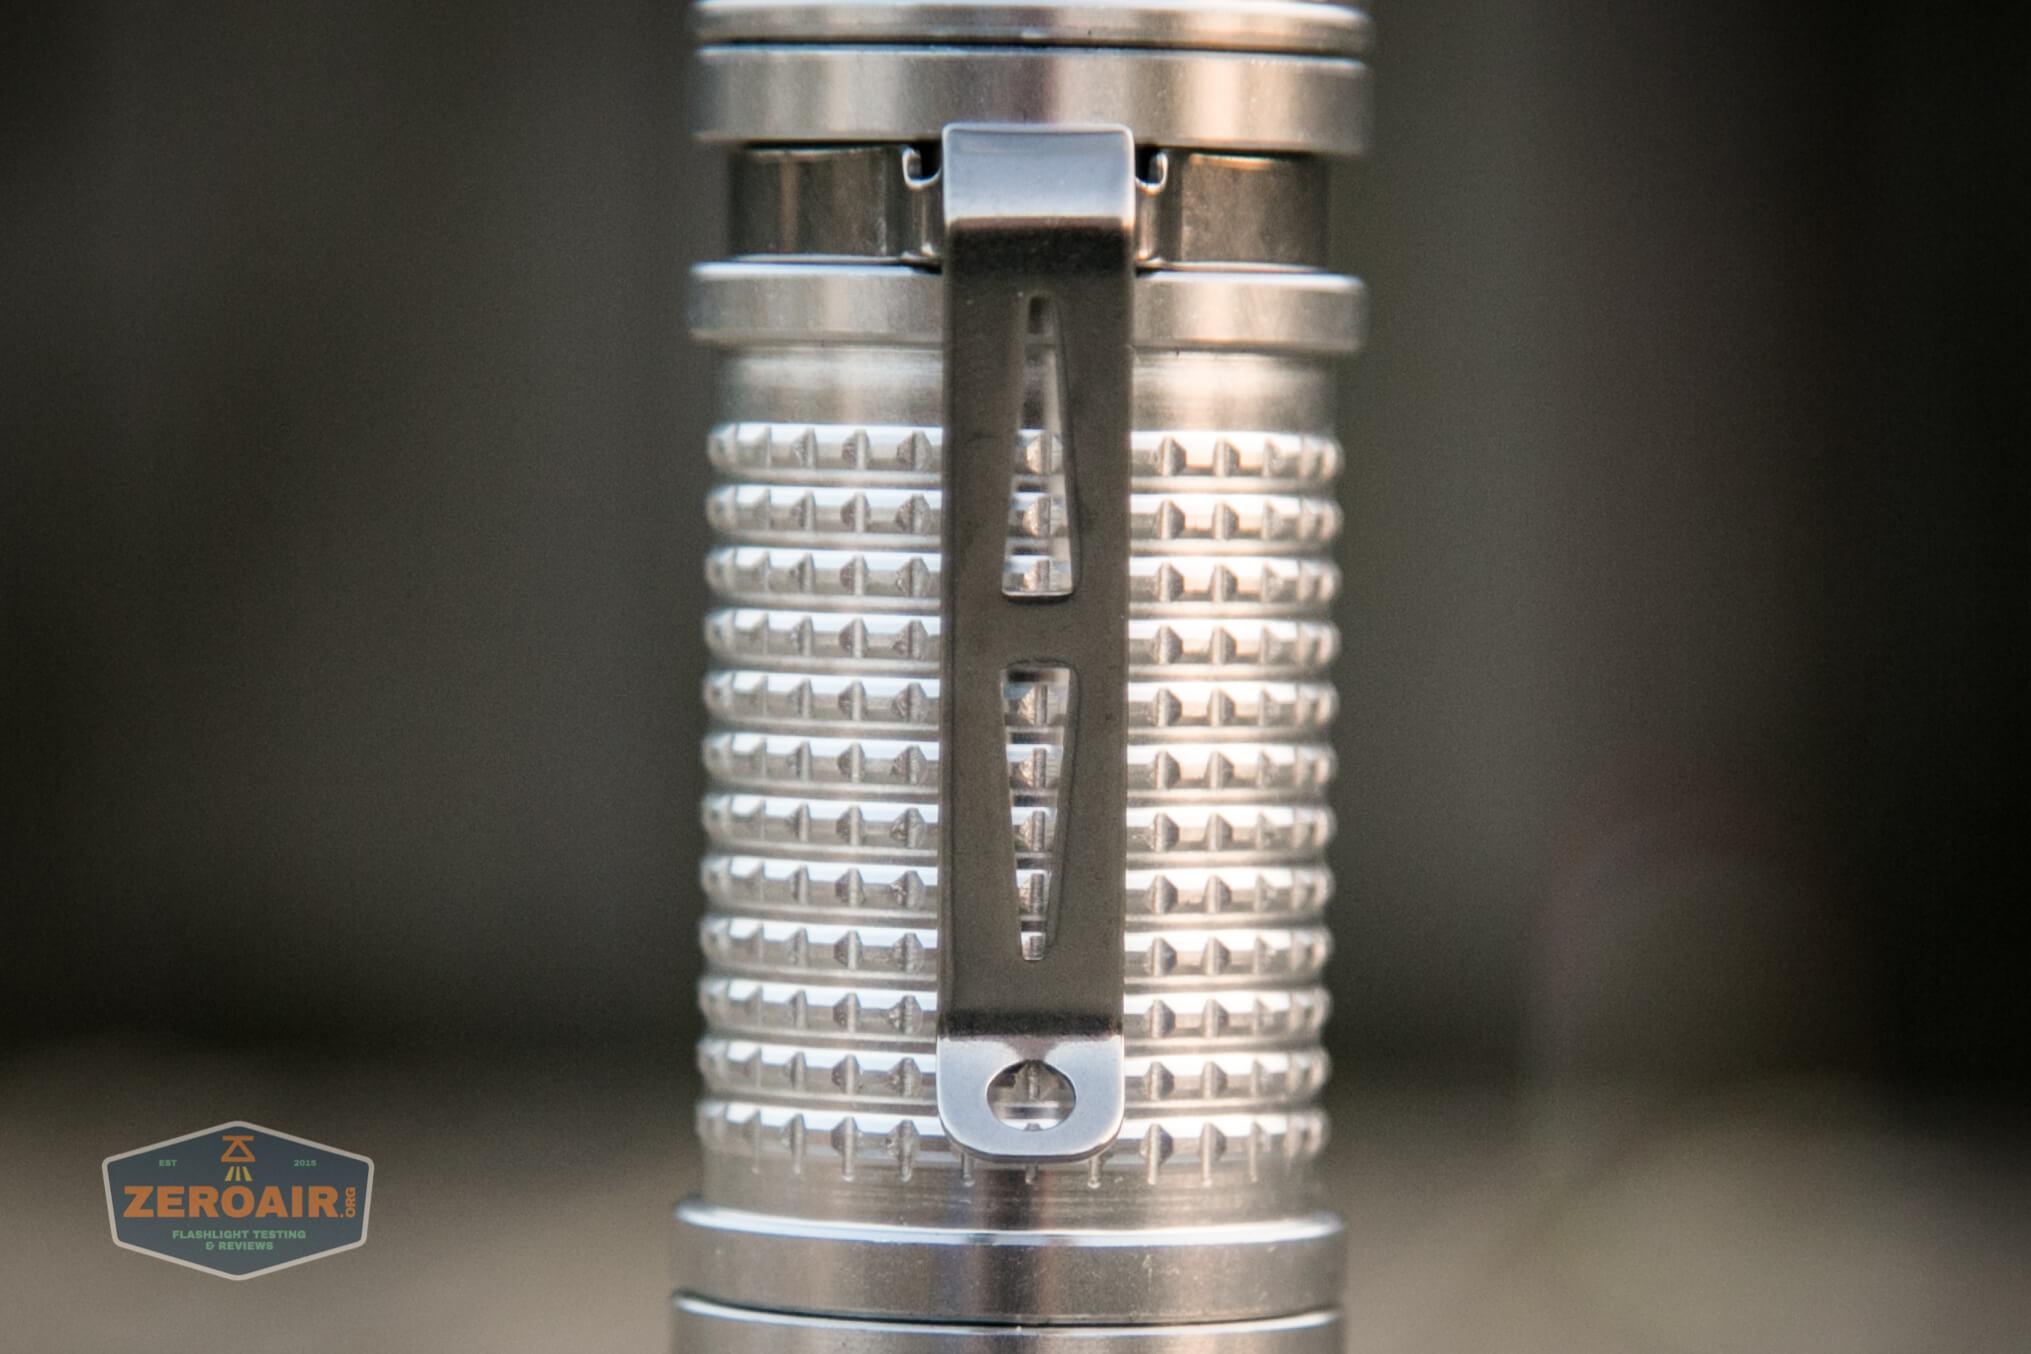 fireflylite e01 luminus sst-40 21700 pocket clip lanyard slots